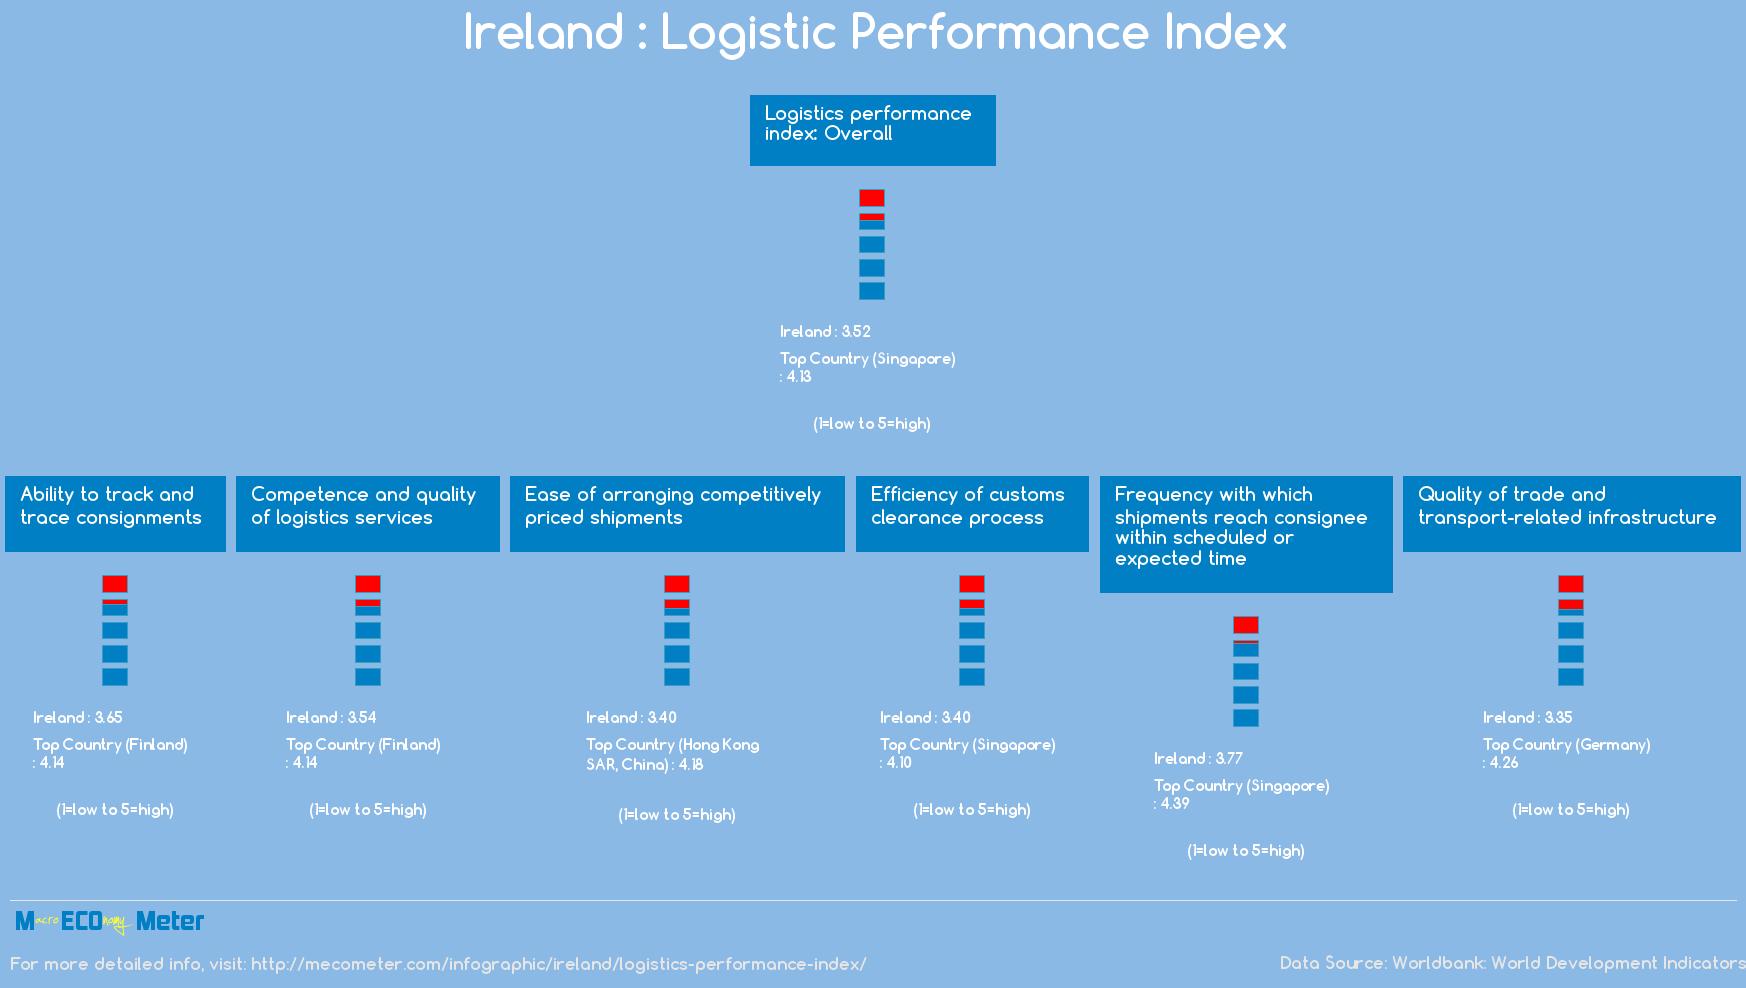 Ireland : Logistic Performance Index